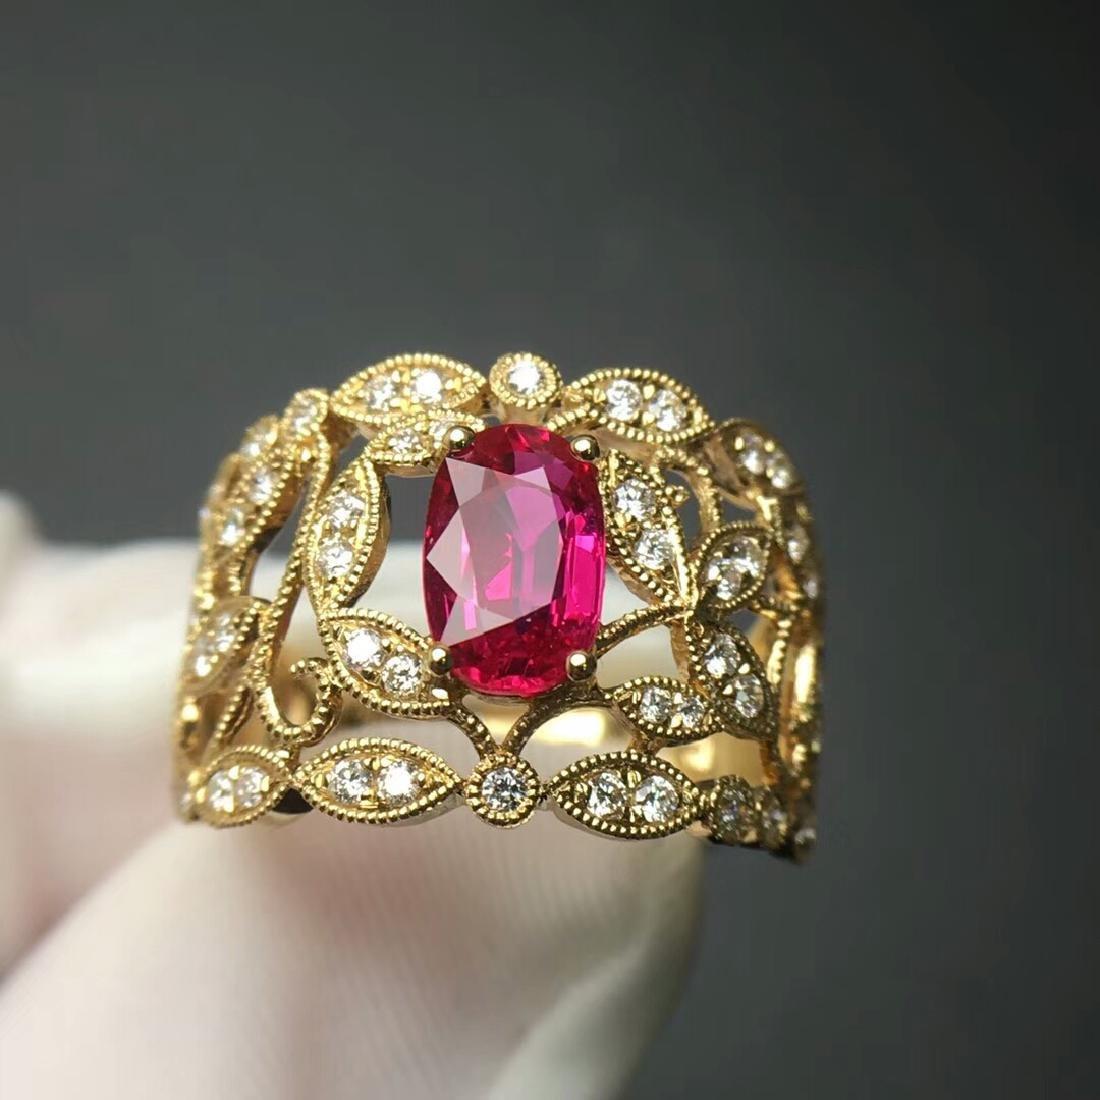 1.0 CTW Tourmaline & VS Diamond Ring 18K